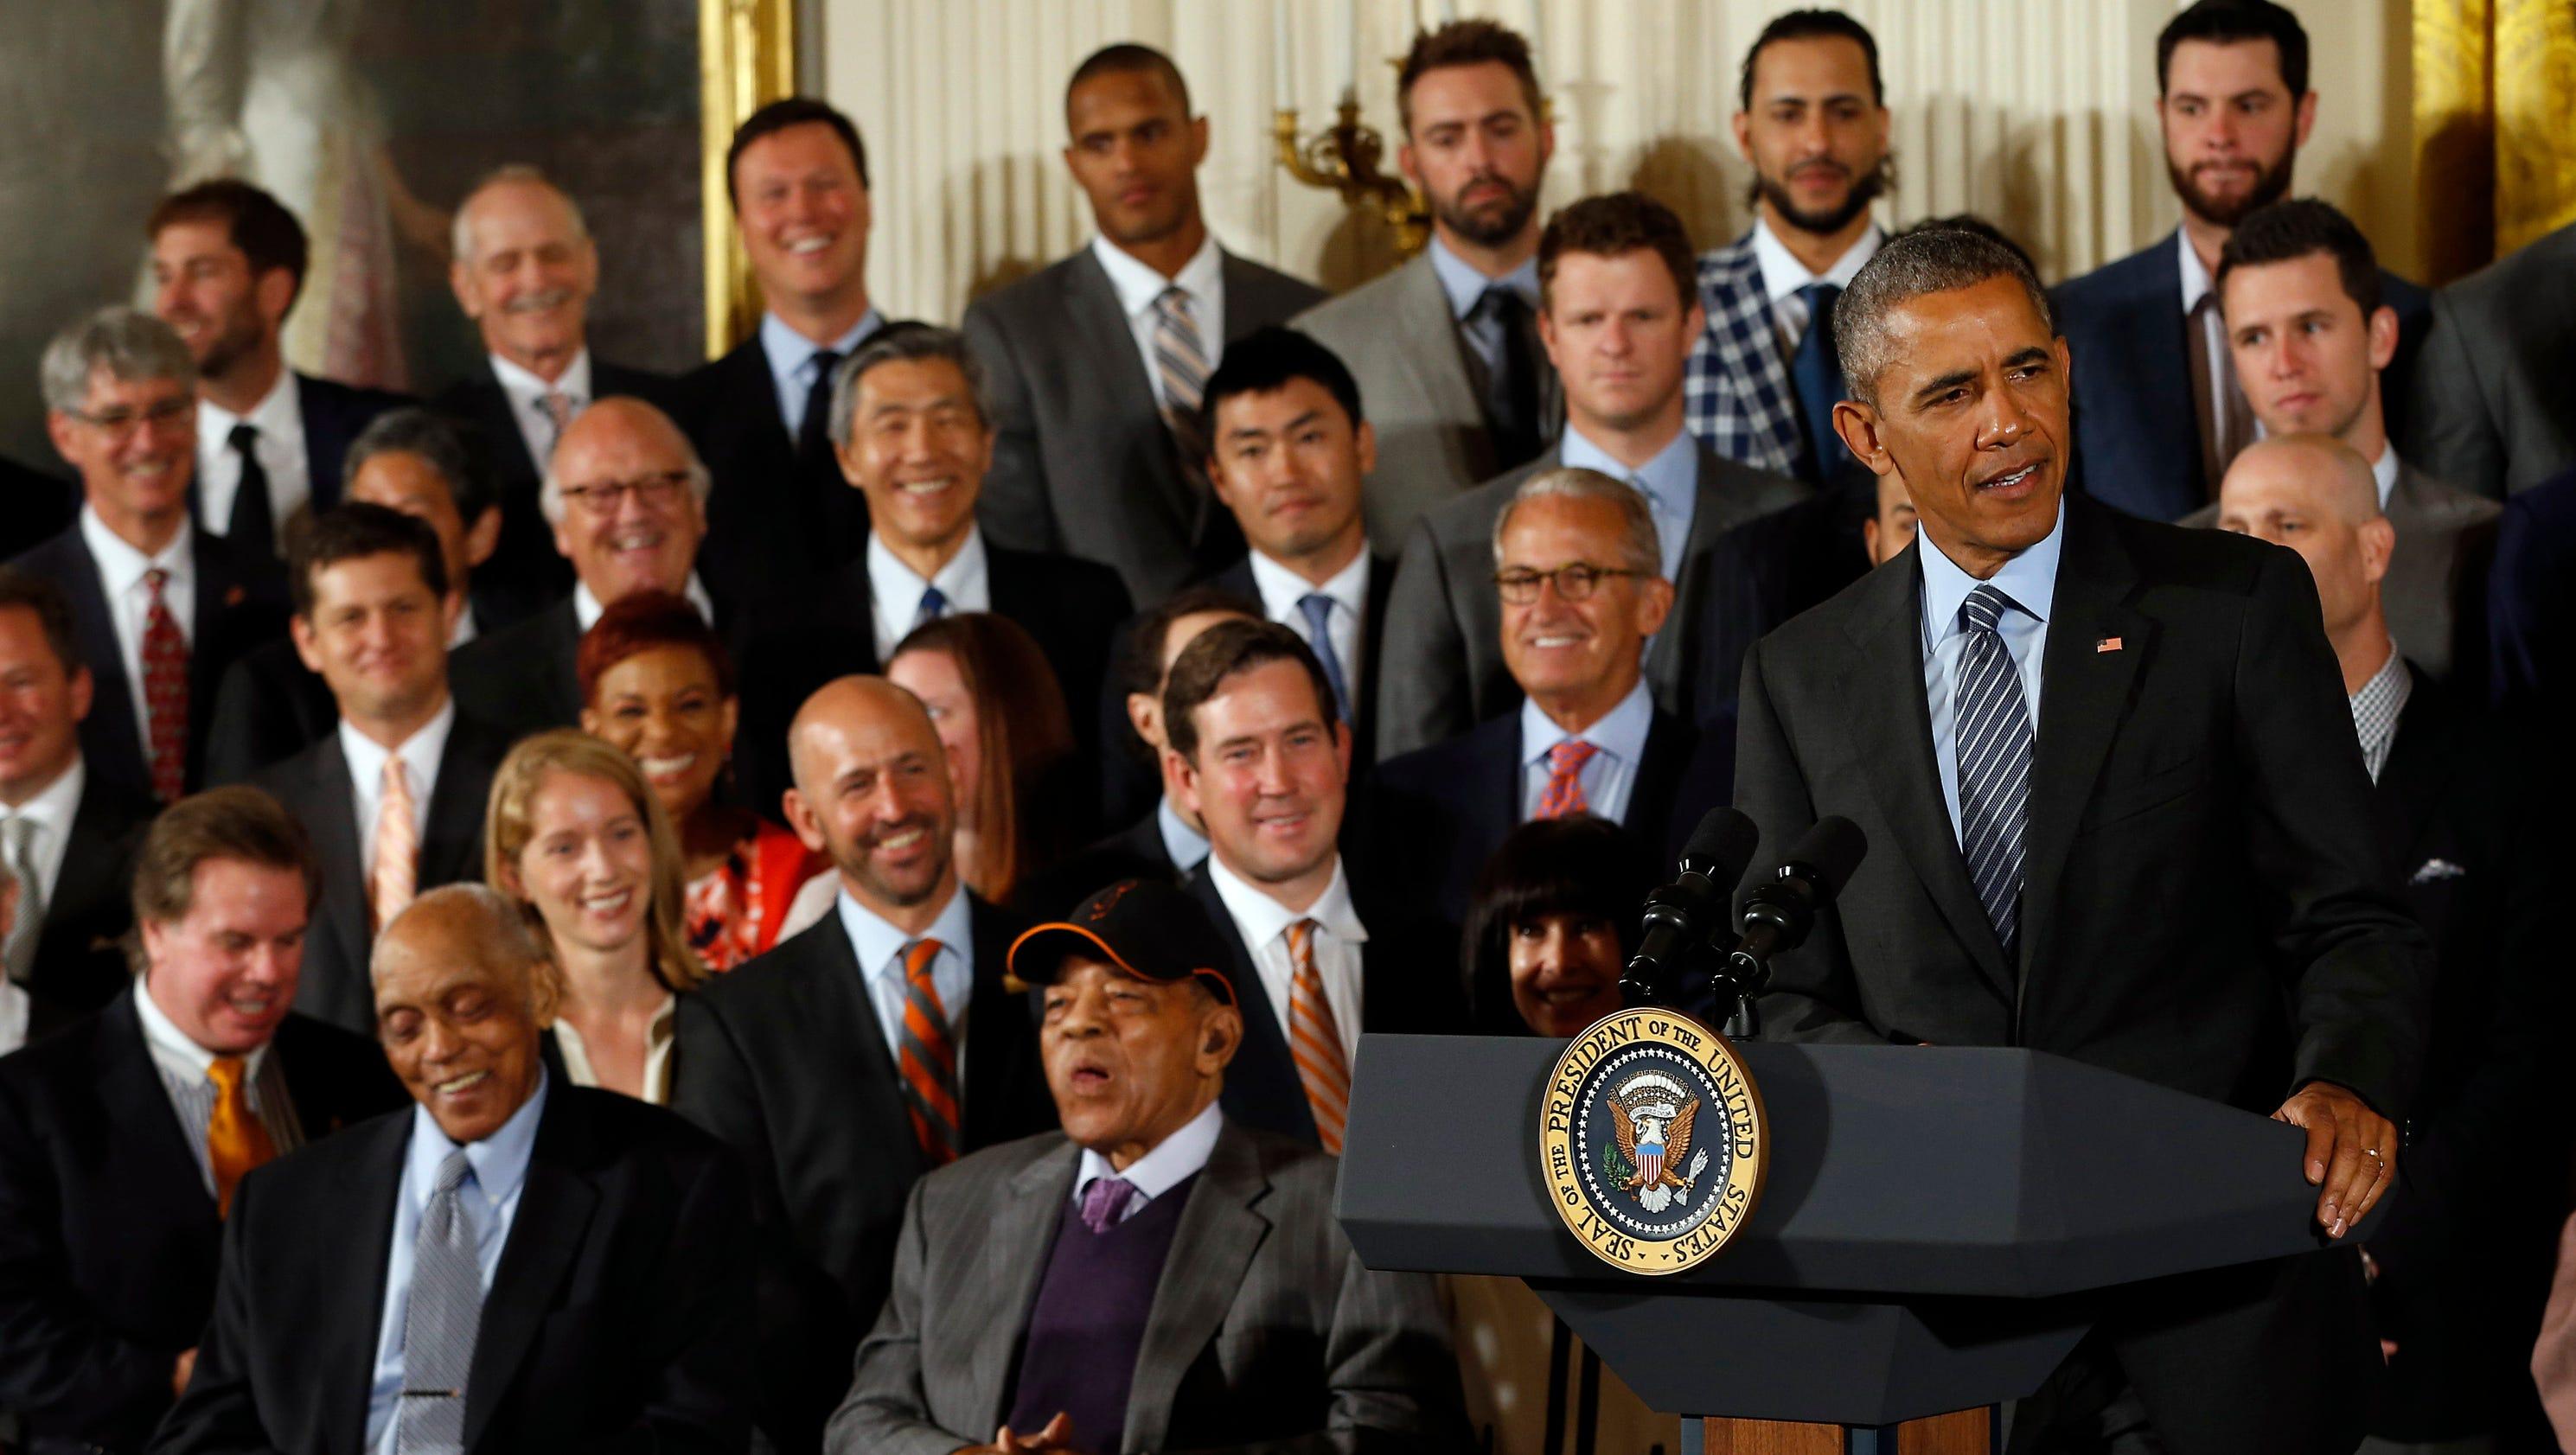 Two terms, three titles: President Obama, San Francisco ...